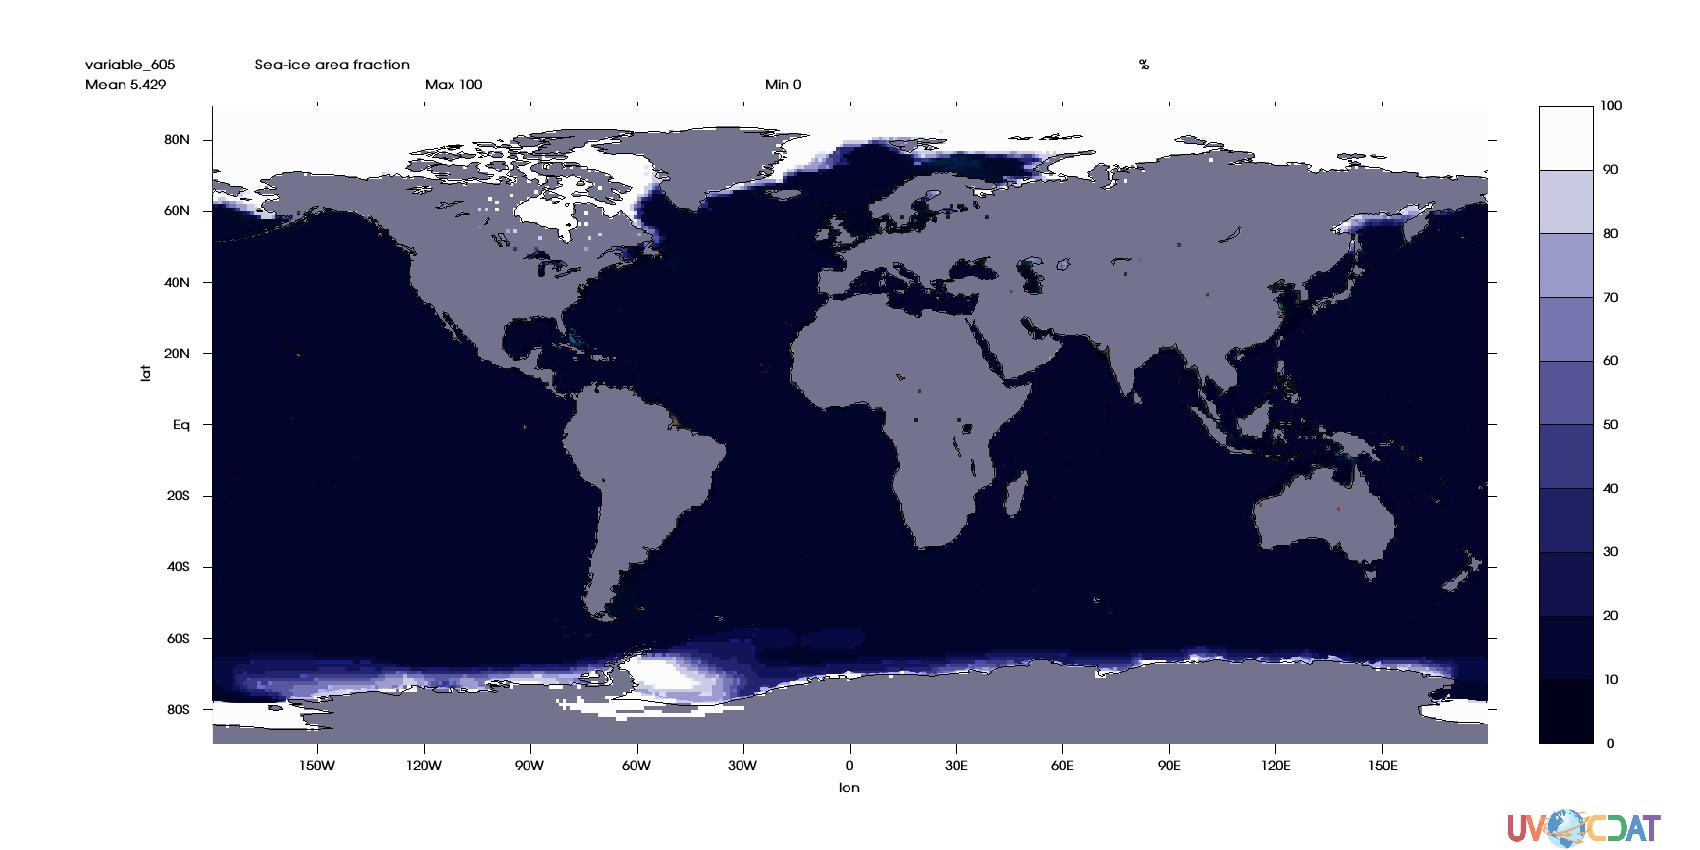 bluemarble_siconc_satellite_view_daytimeview_boxfill